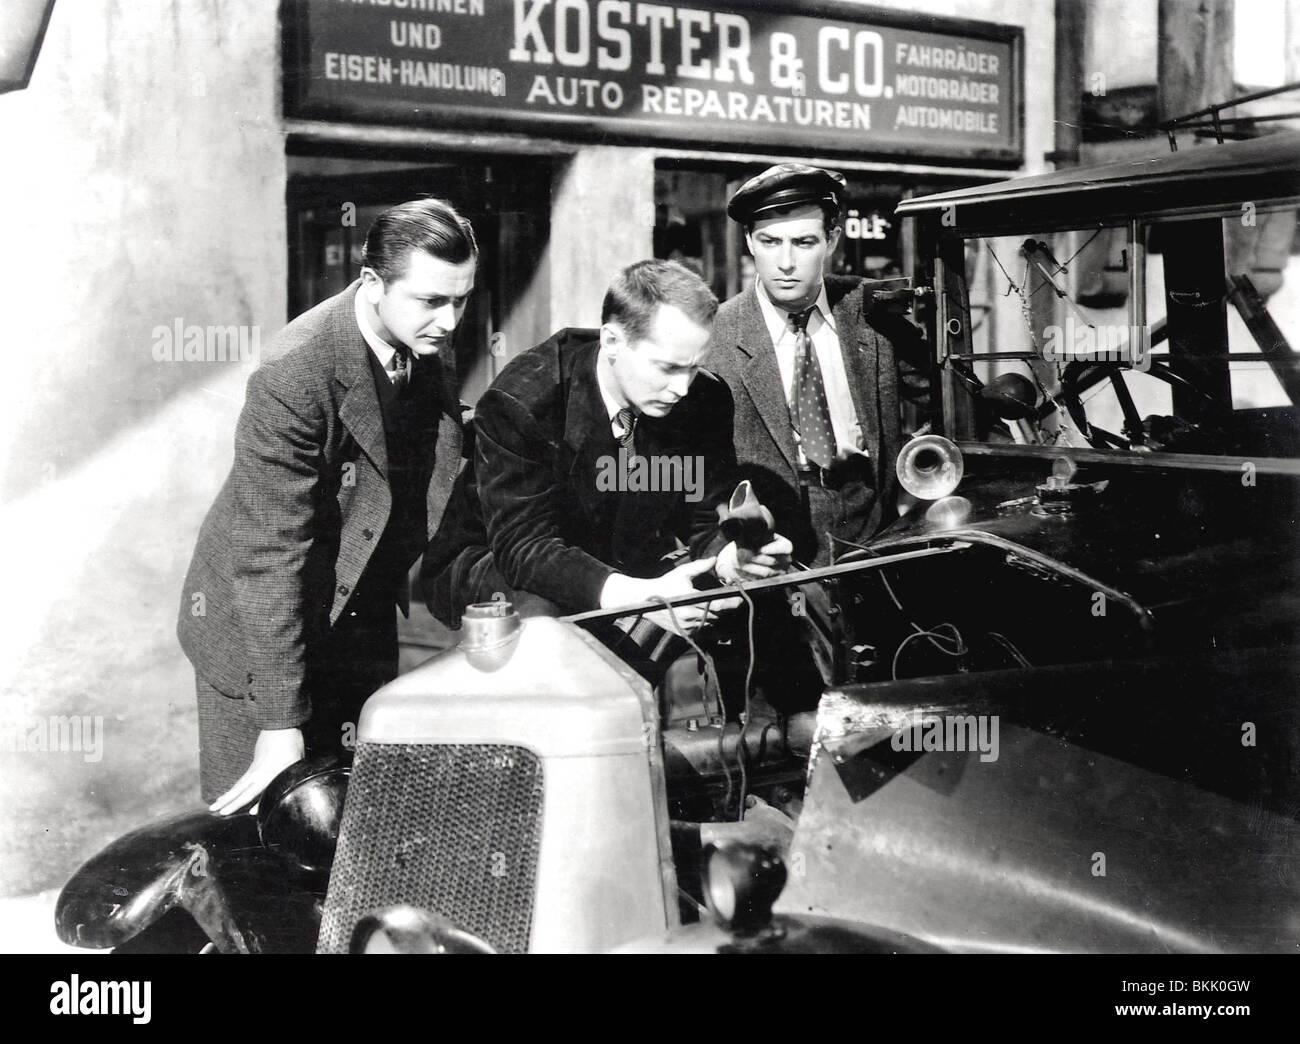 Trois camarades (1938) ROBERT YOUNG, Franchot Tone, ROBERT TAYLOR TREC 001 P Photo Stock